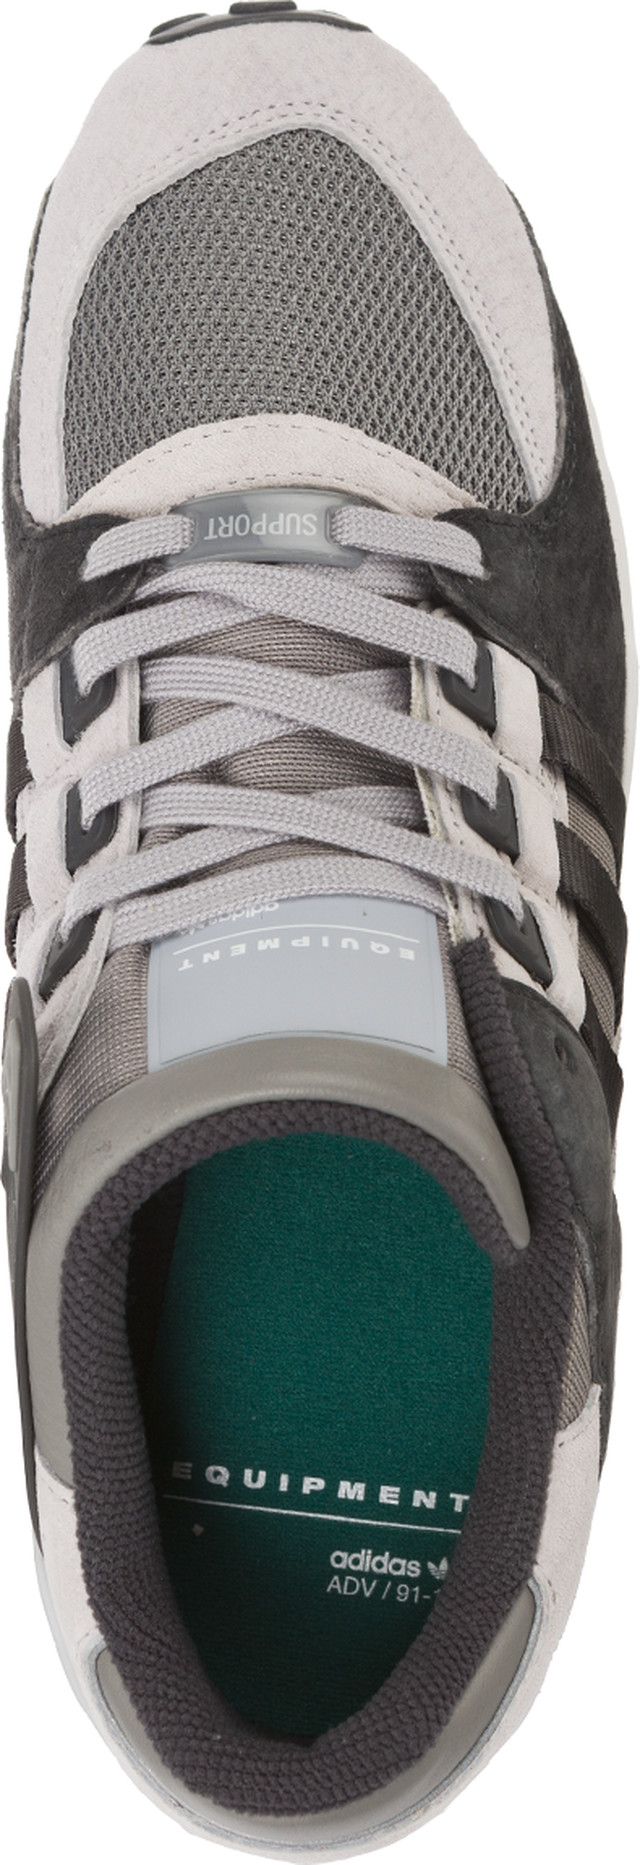 de7e7bd23 ... RF 317 </small Buty adidas <br/><small>EQT SUPPORT ...